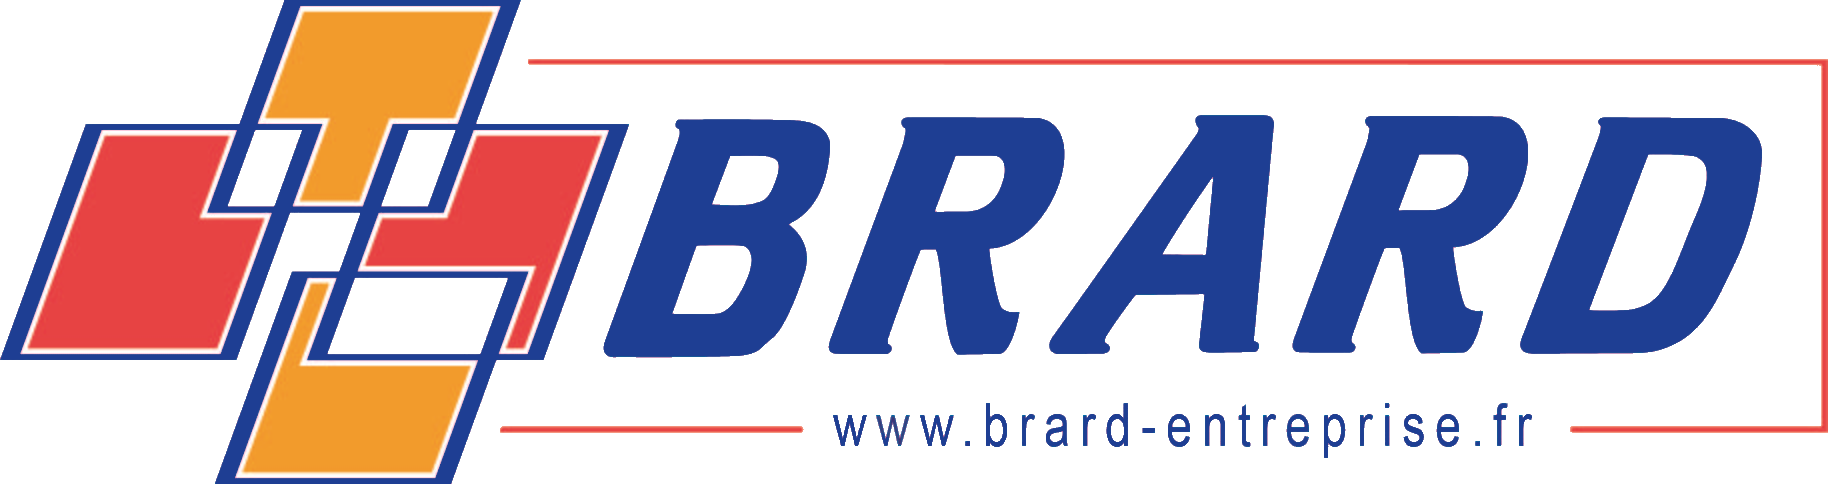 Brard-entreprise